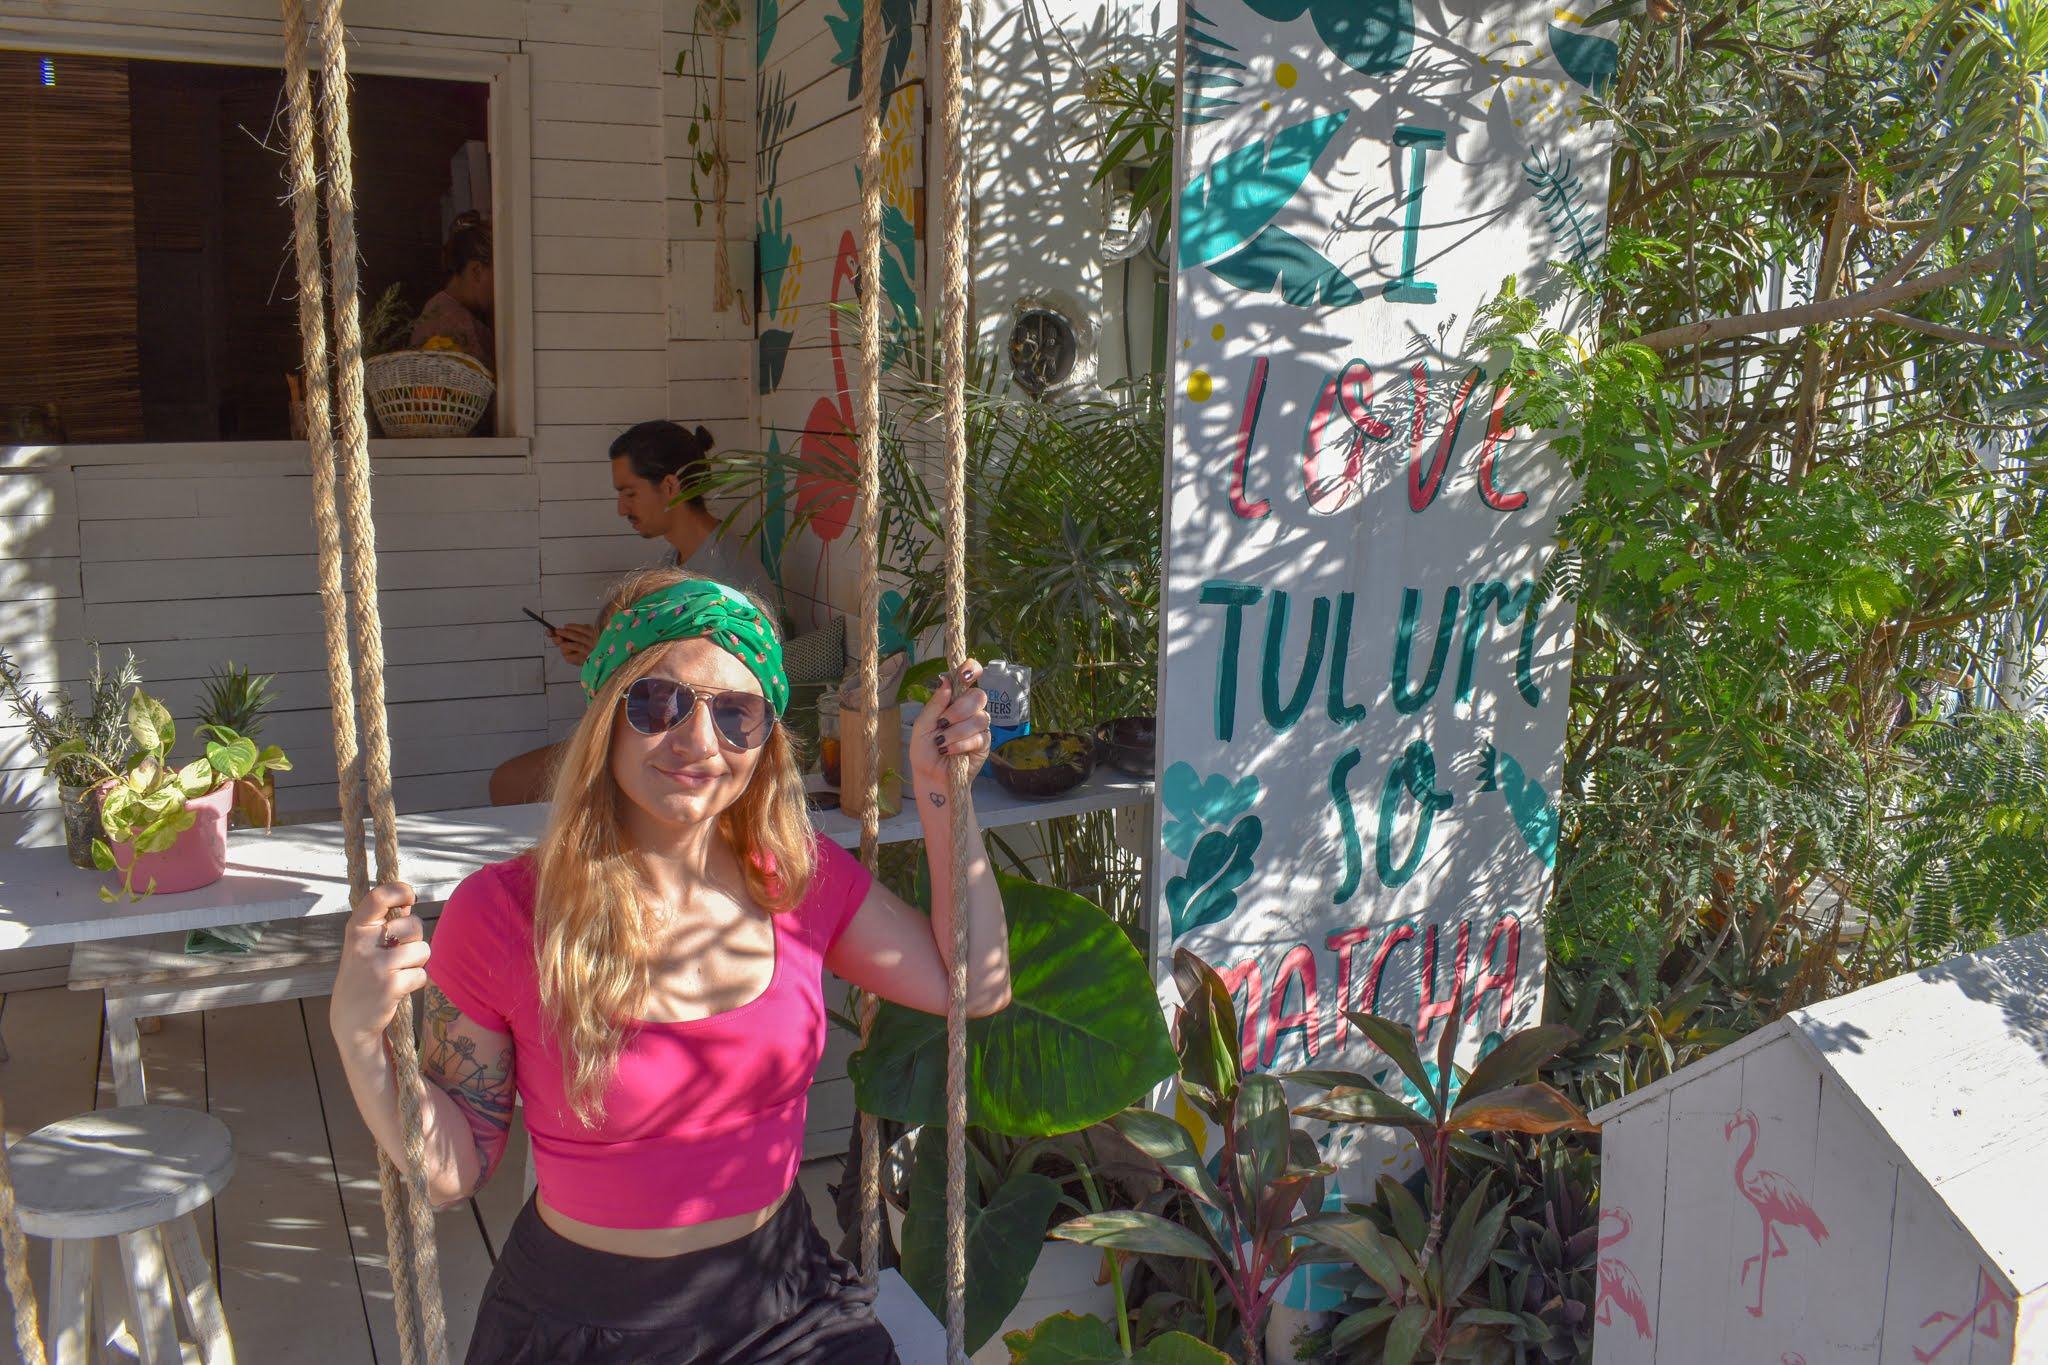 Uprooted-Traveler-Vegan-Weekend-in-Tulum-Mexico-matcha-mama-i-love-tulum-so-matcha.jpg